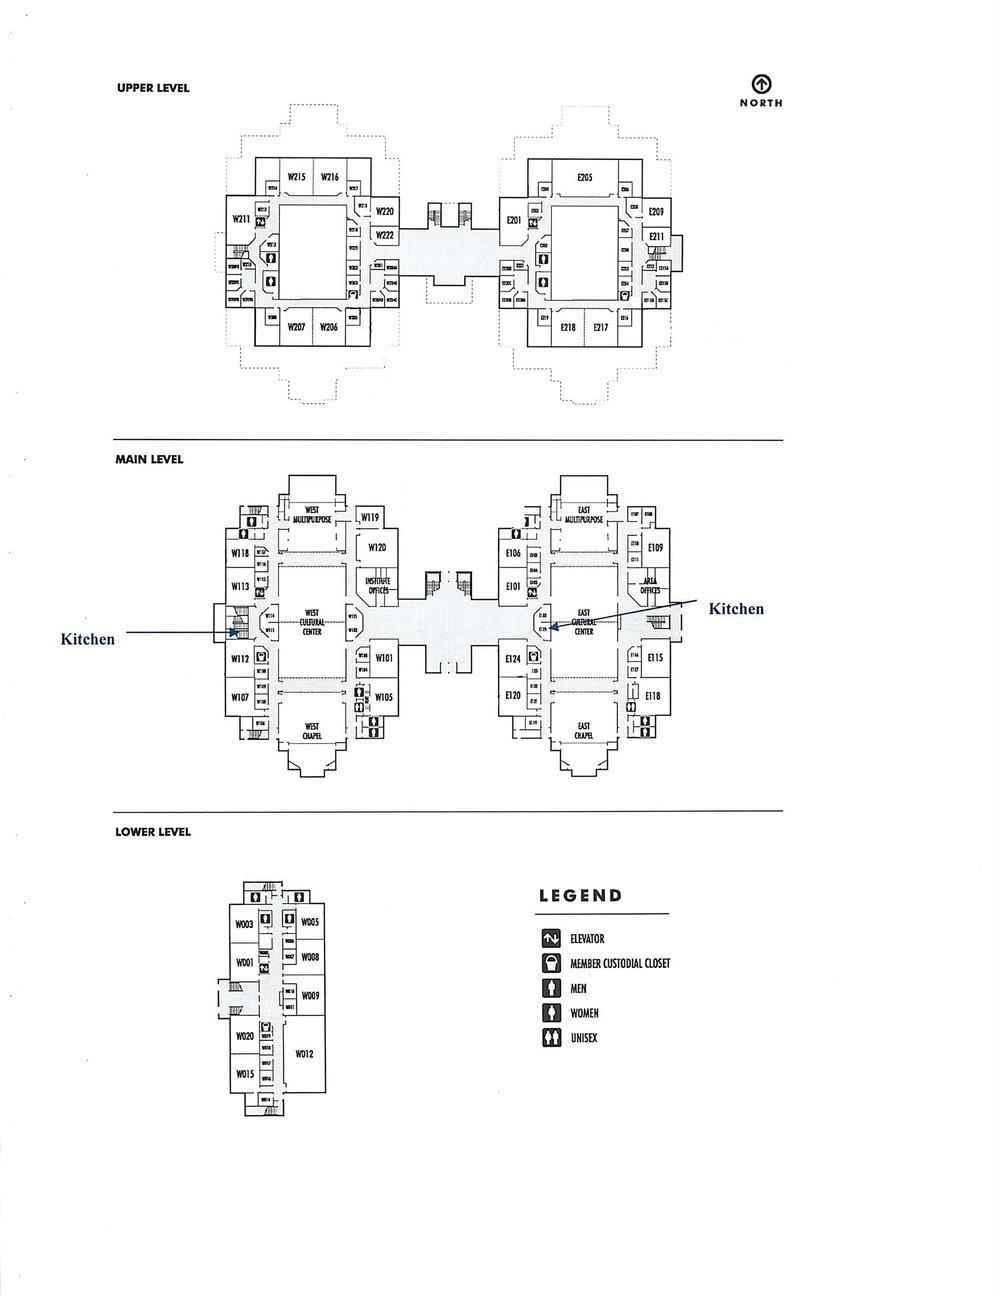 Institute-floor-plan.jpg